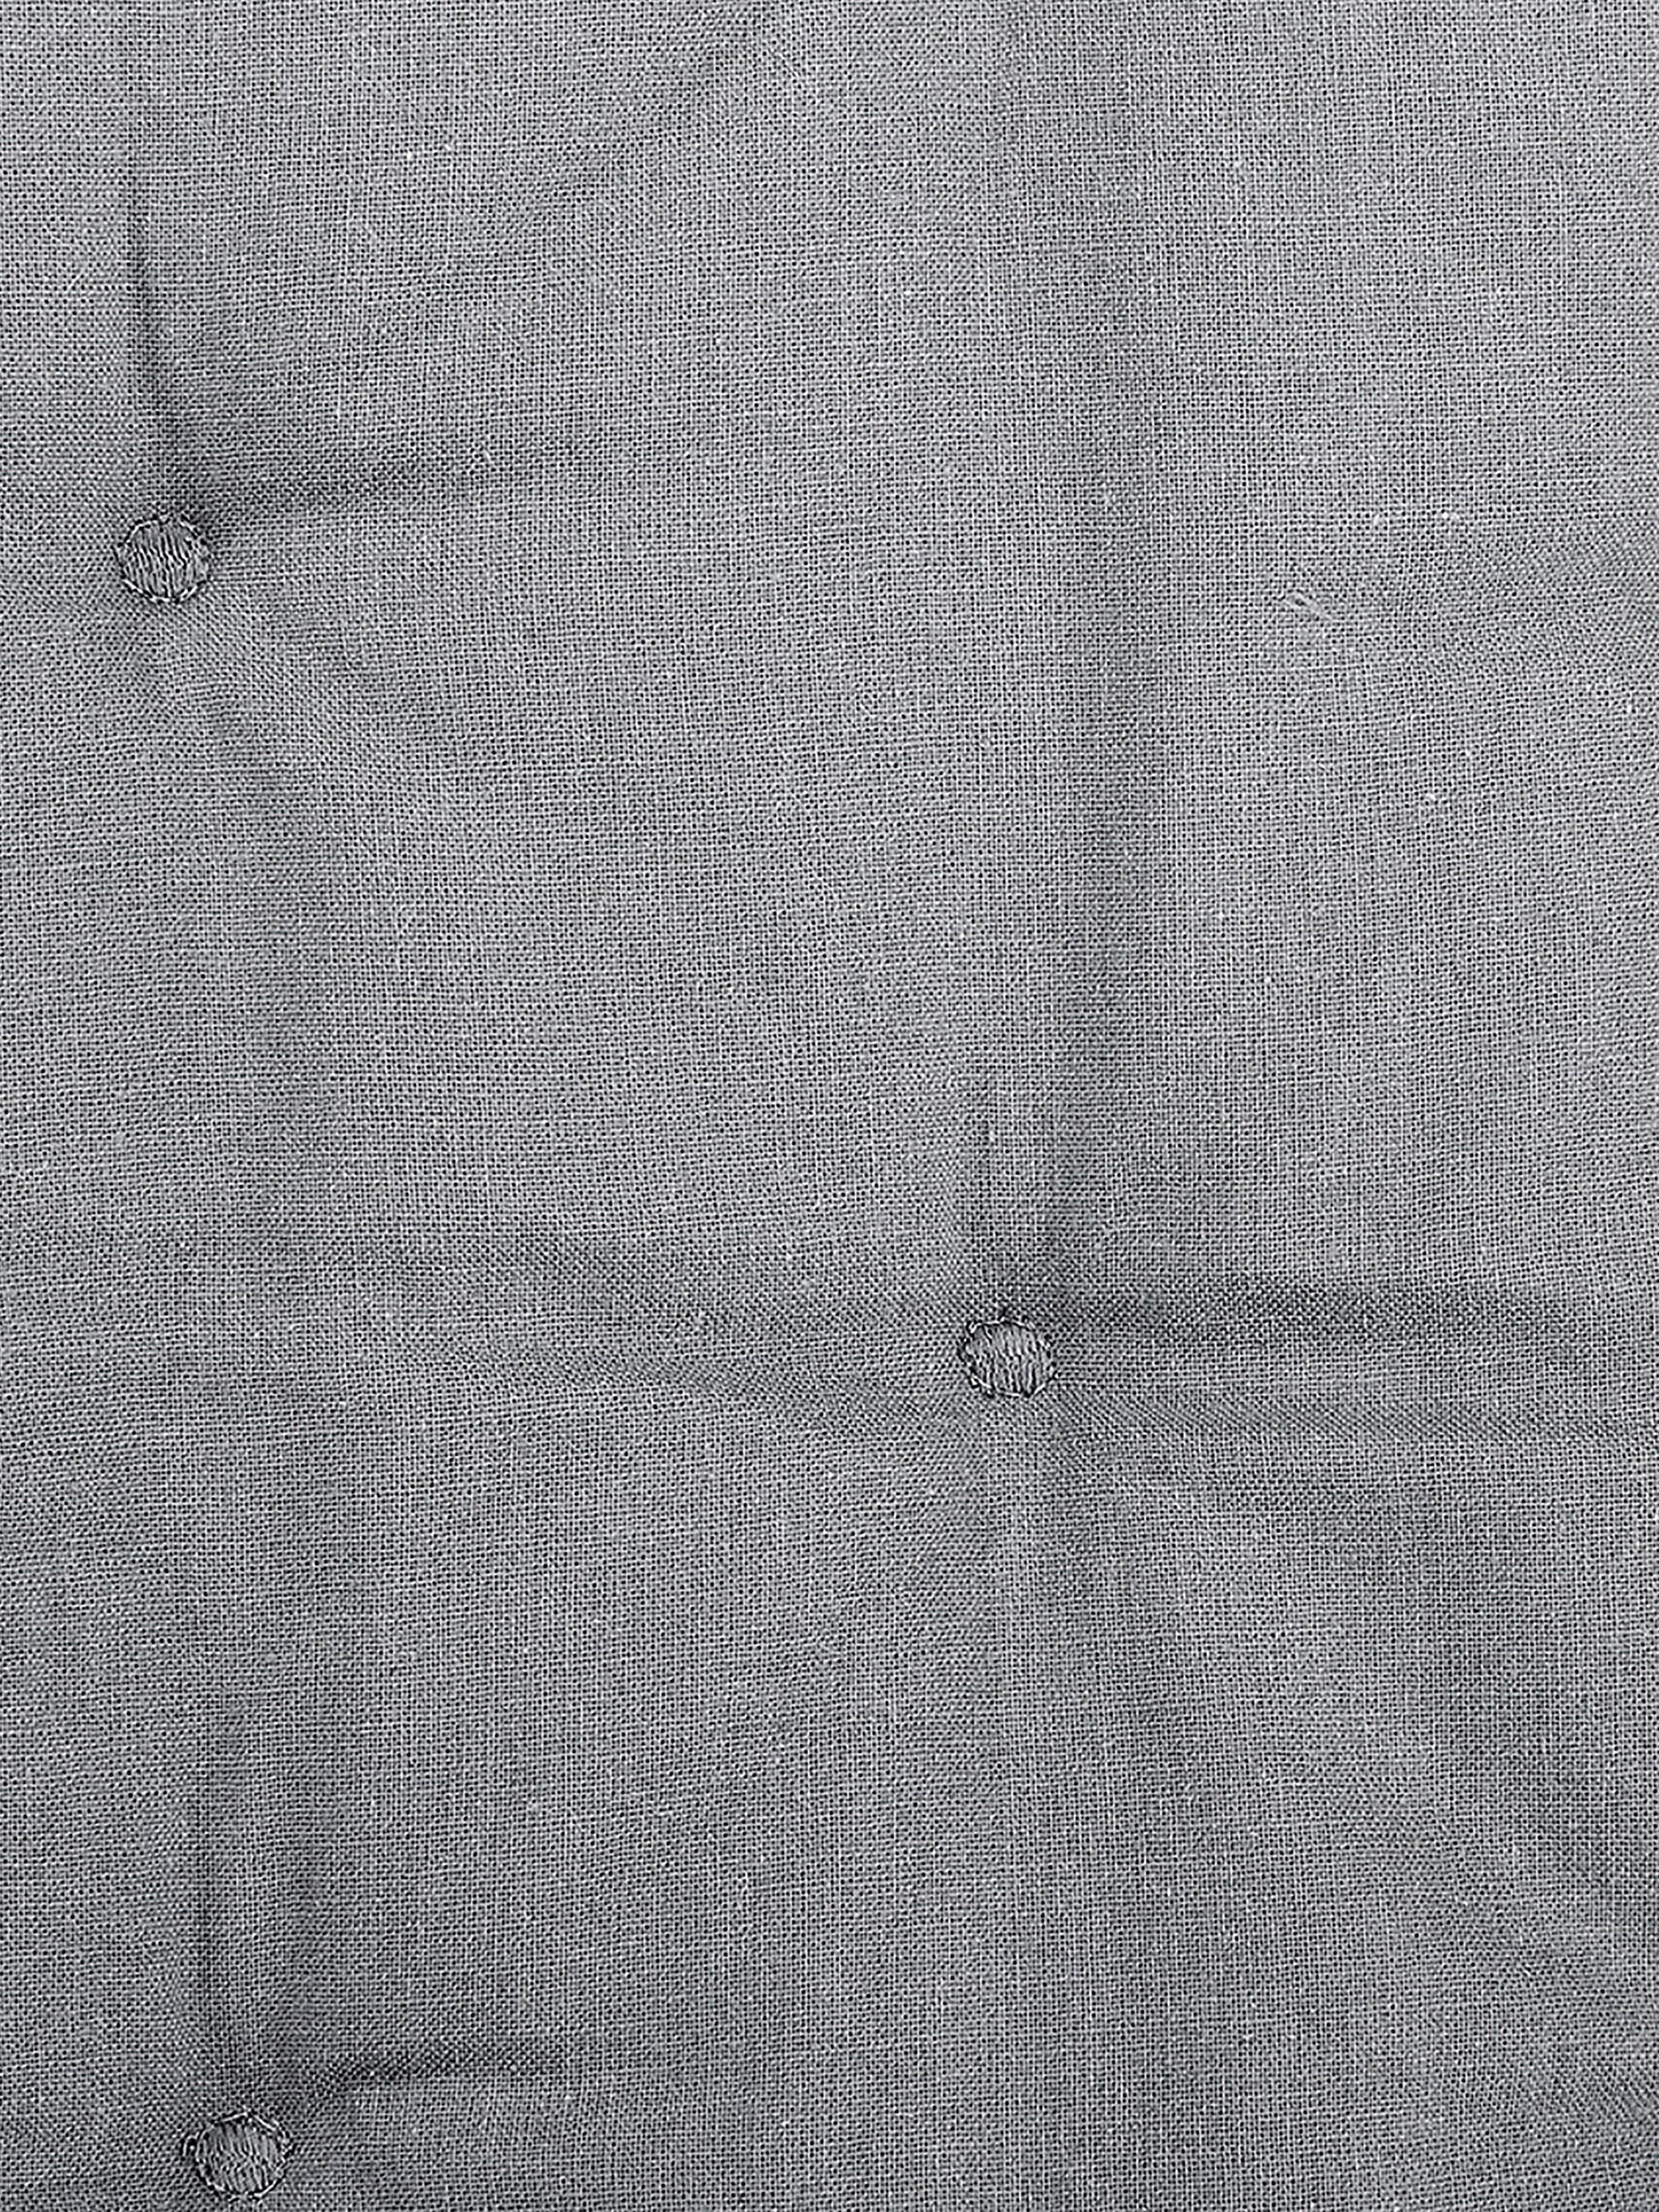 Watowana narzuta z aksamitu Cheryl, Szary, S 160 x D 220 cm